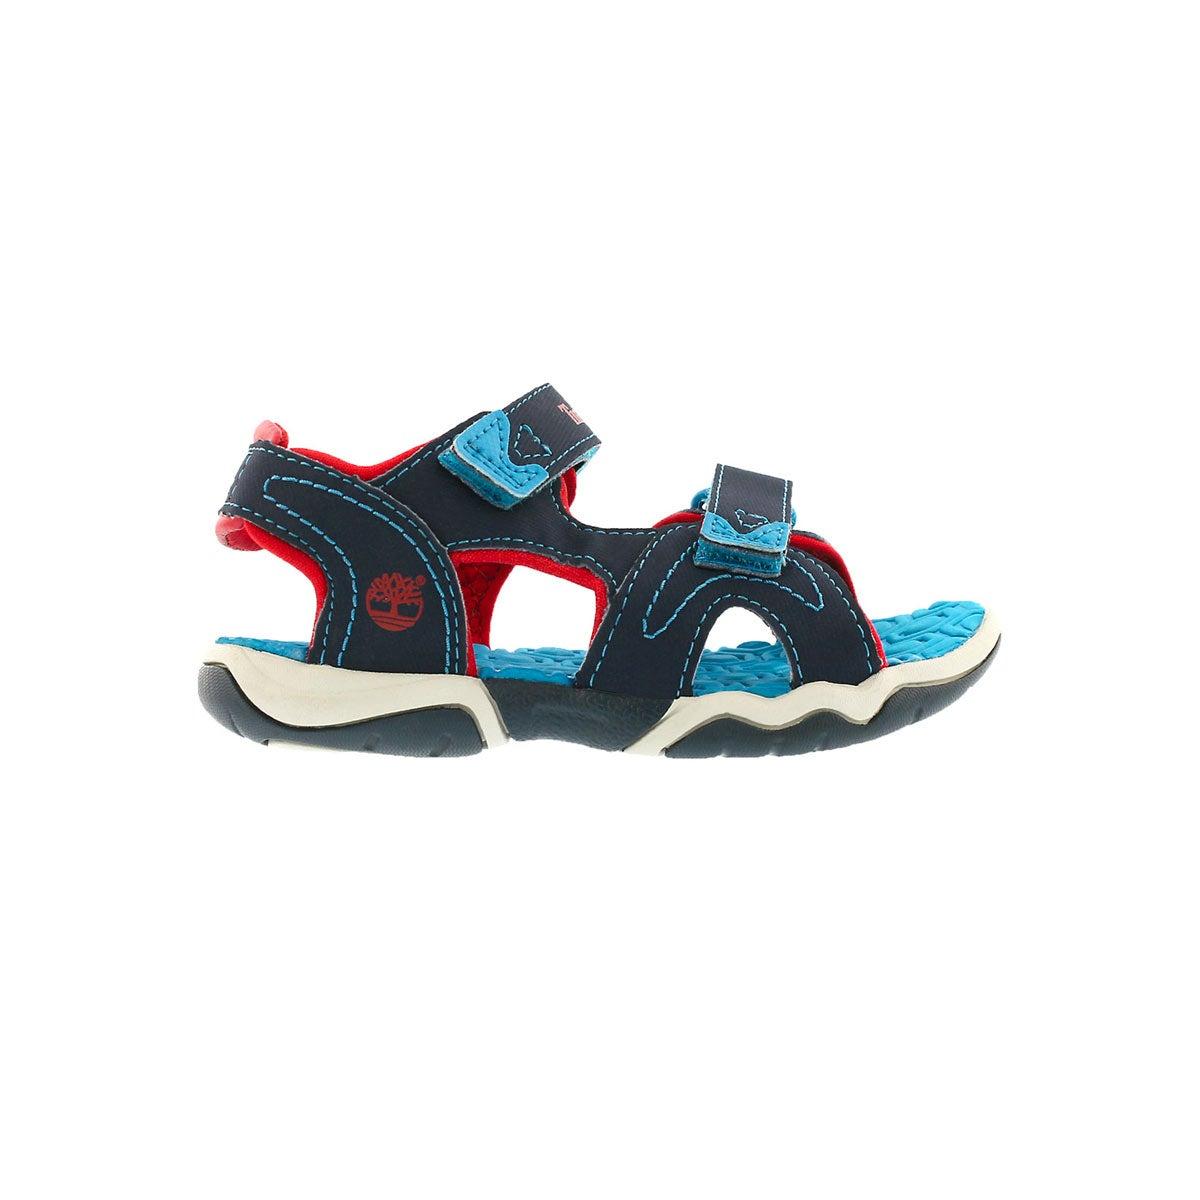 Infs-b Adventure Seeker nvy/red sandal